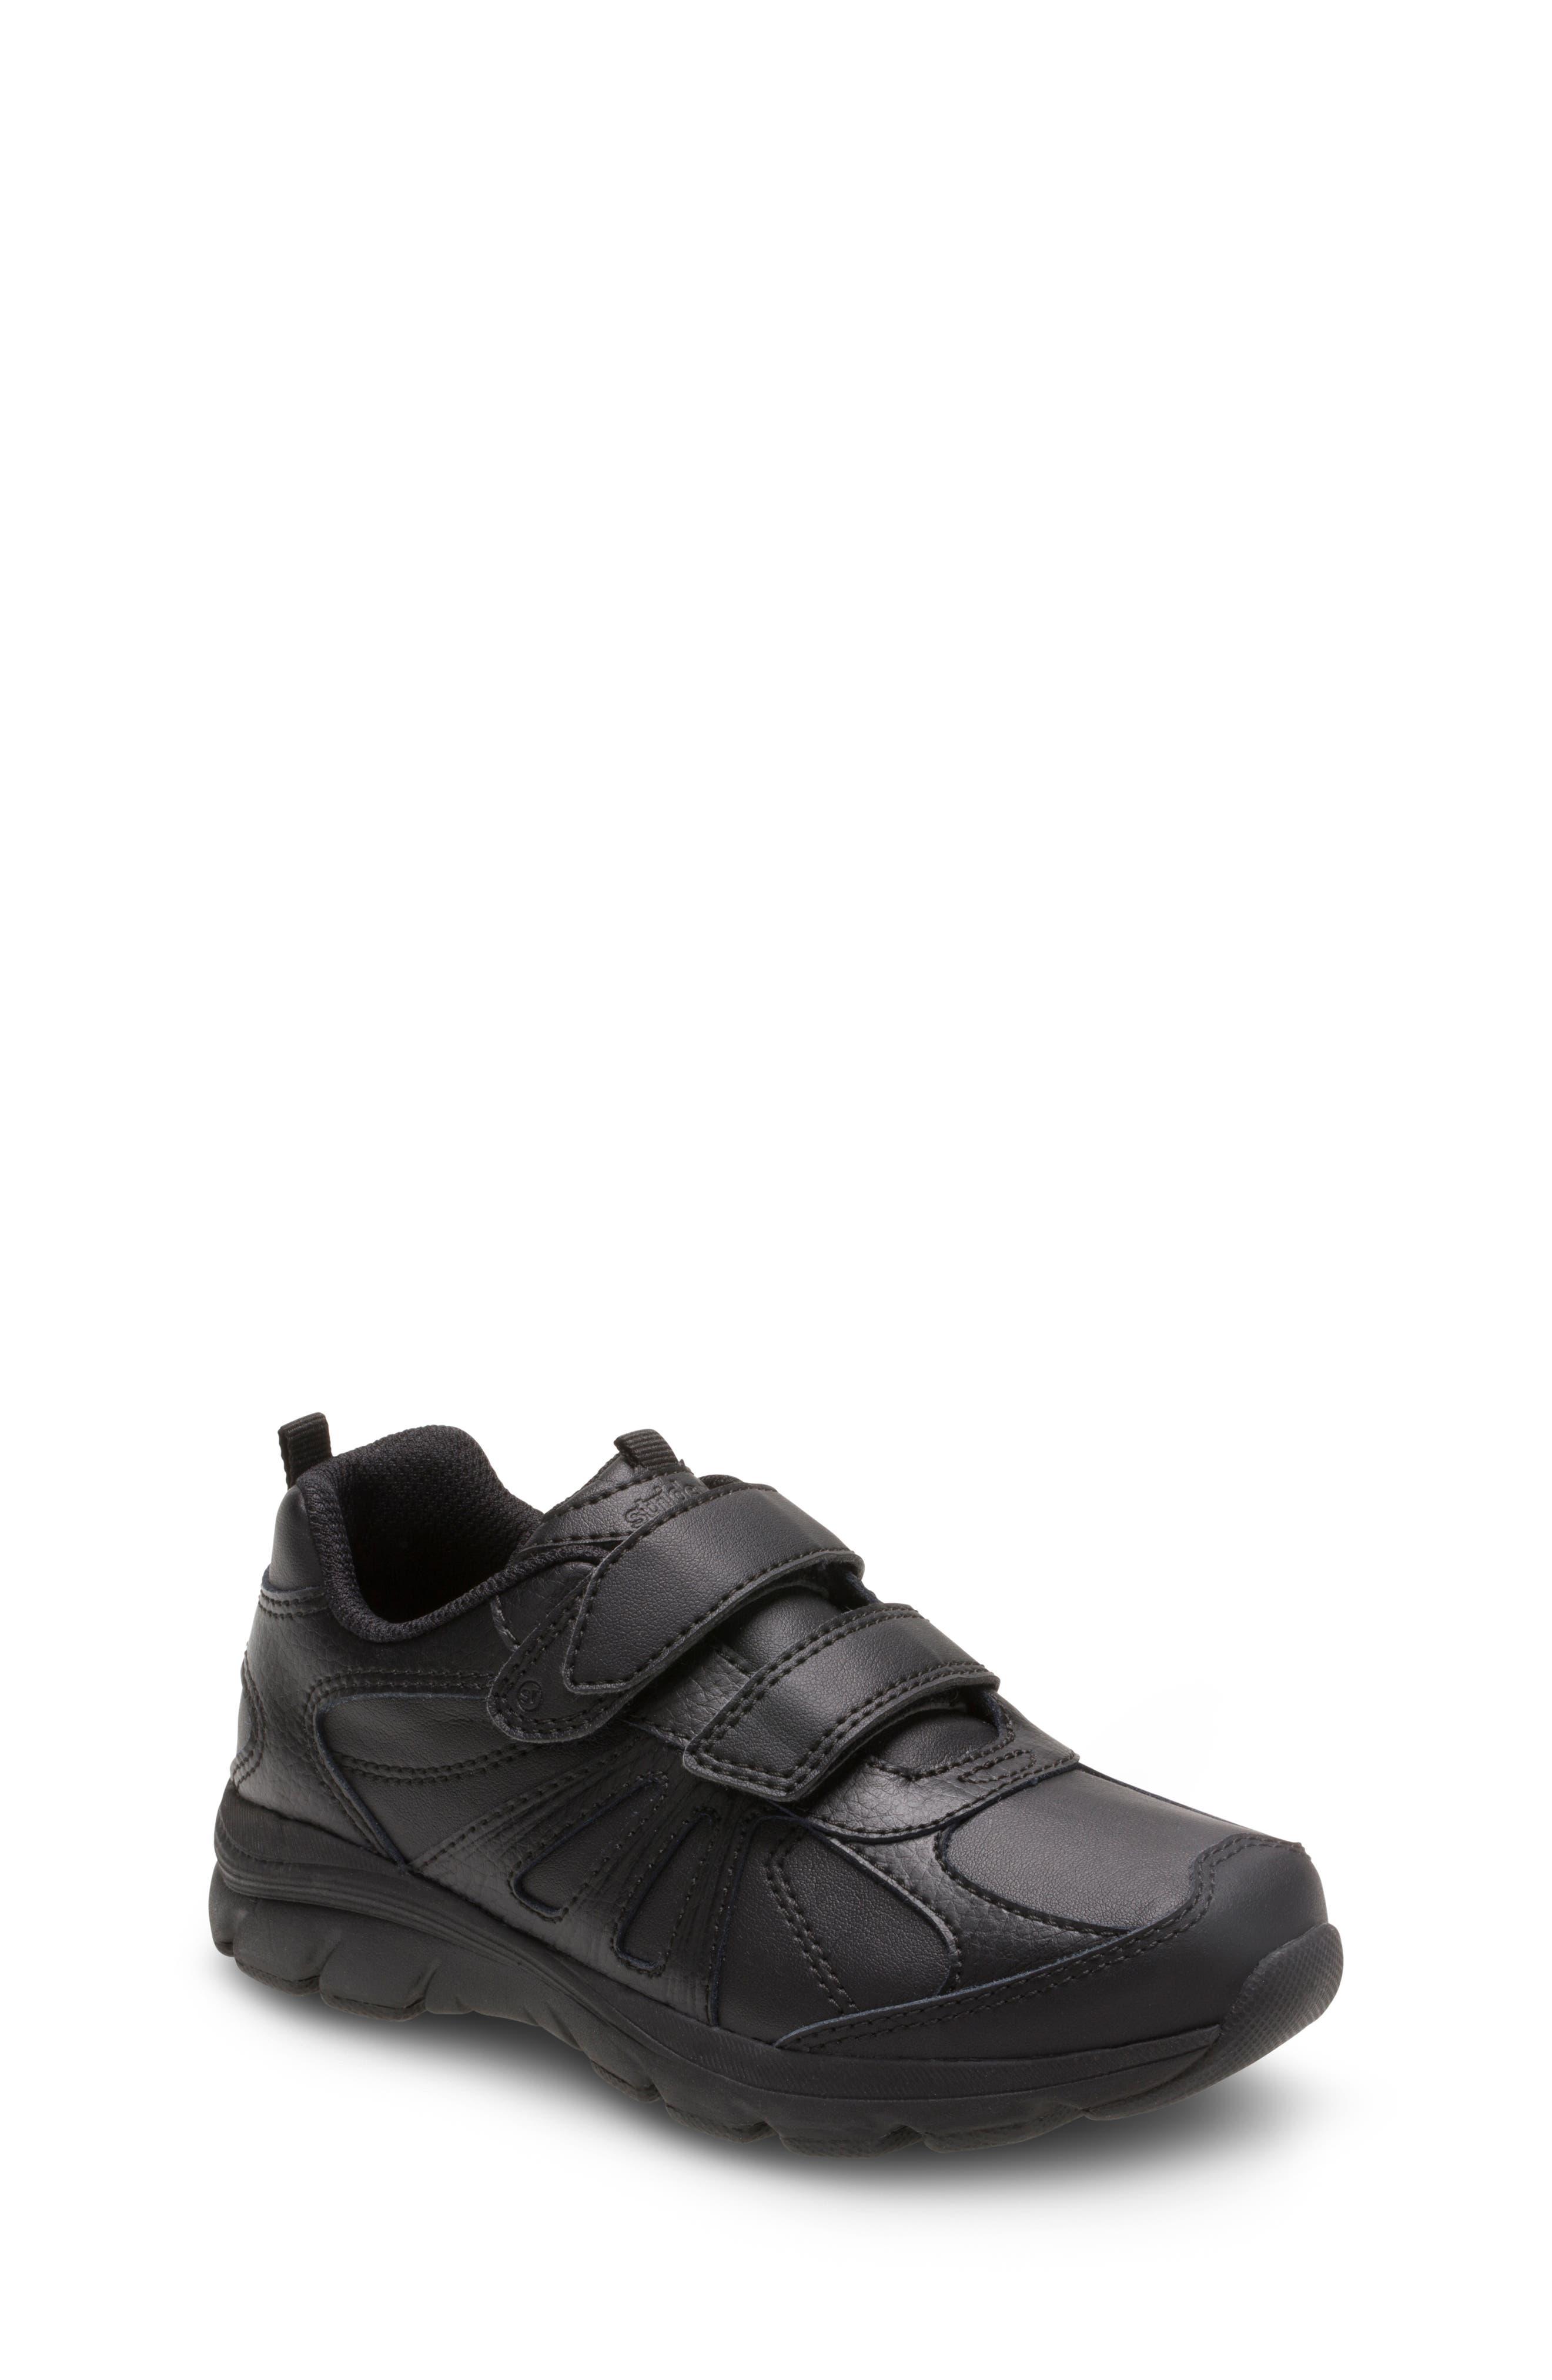 Cooper 2.0 Sneaker,                         Main,                         color, BLACK